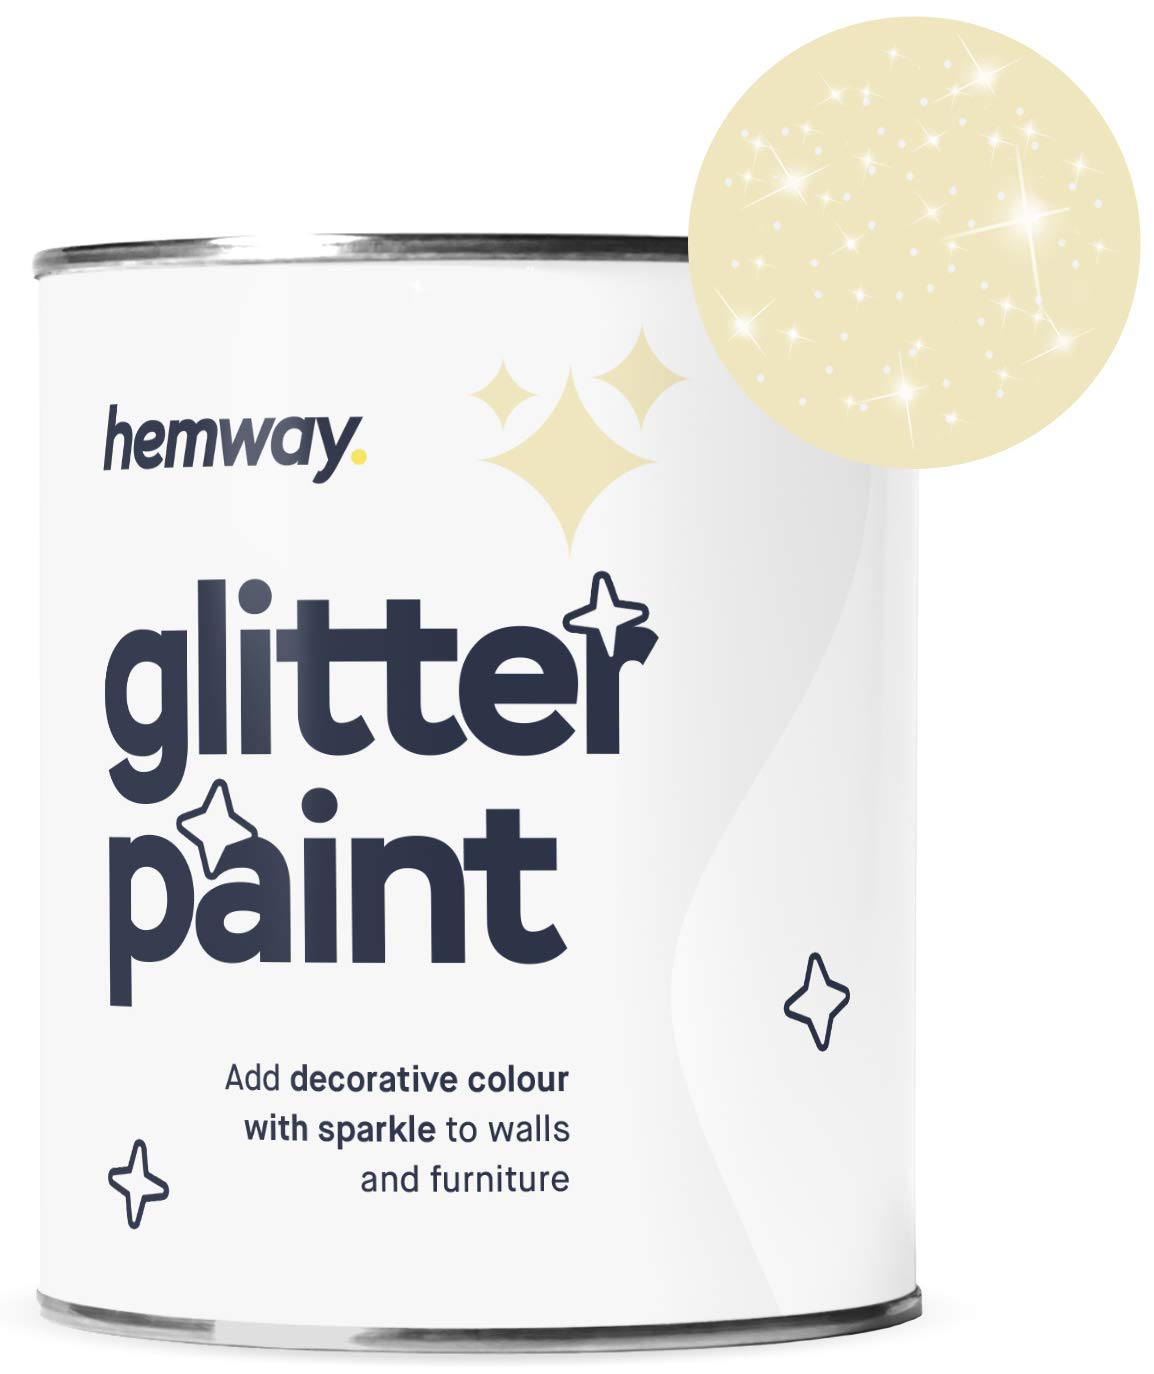 Hemway Silver Glitter Paint 1L Matte Walls Wallpaper Bathroom Furniture Acrylic Latex (Lemon Chiffon Yellow)